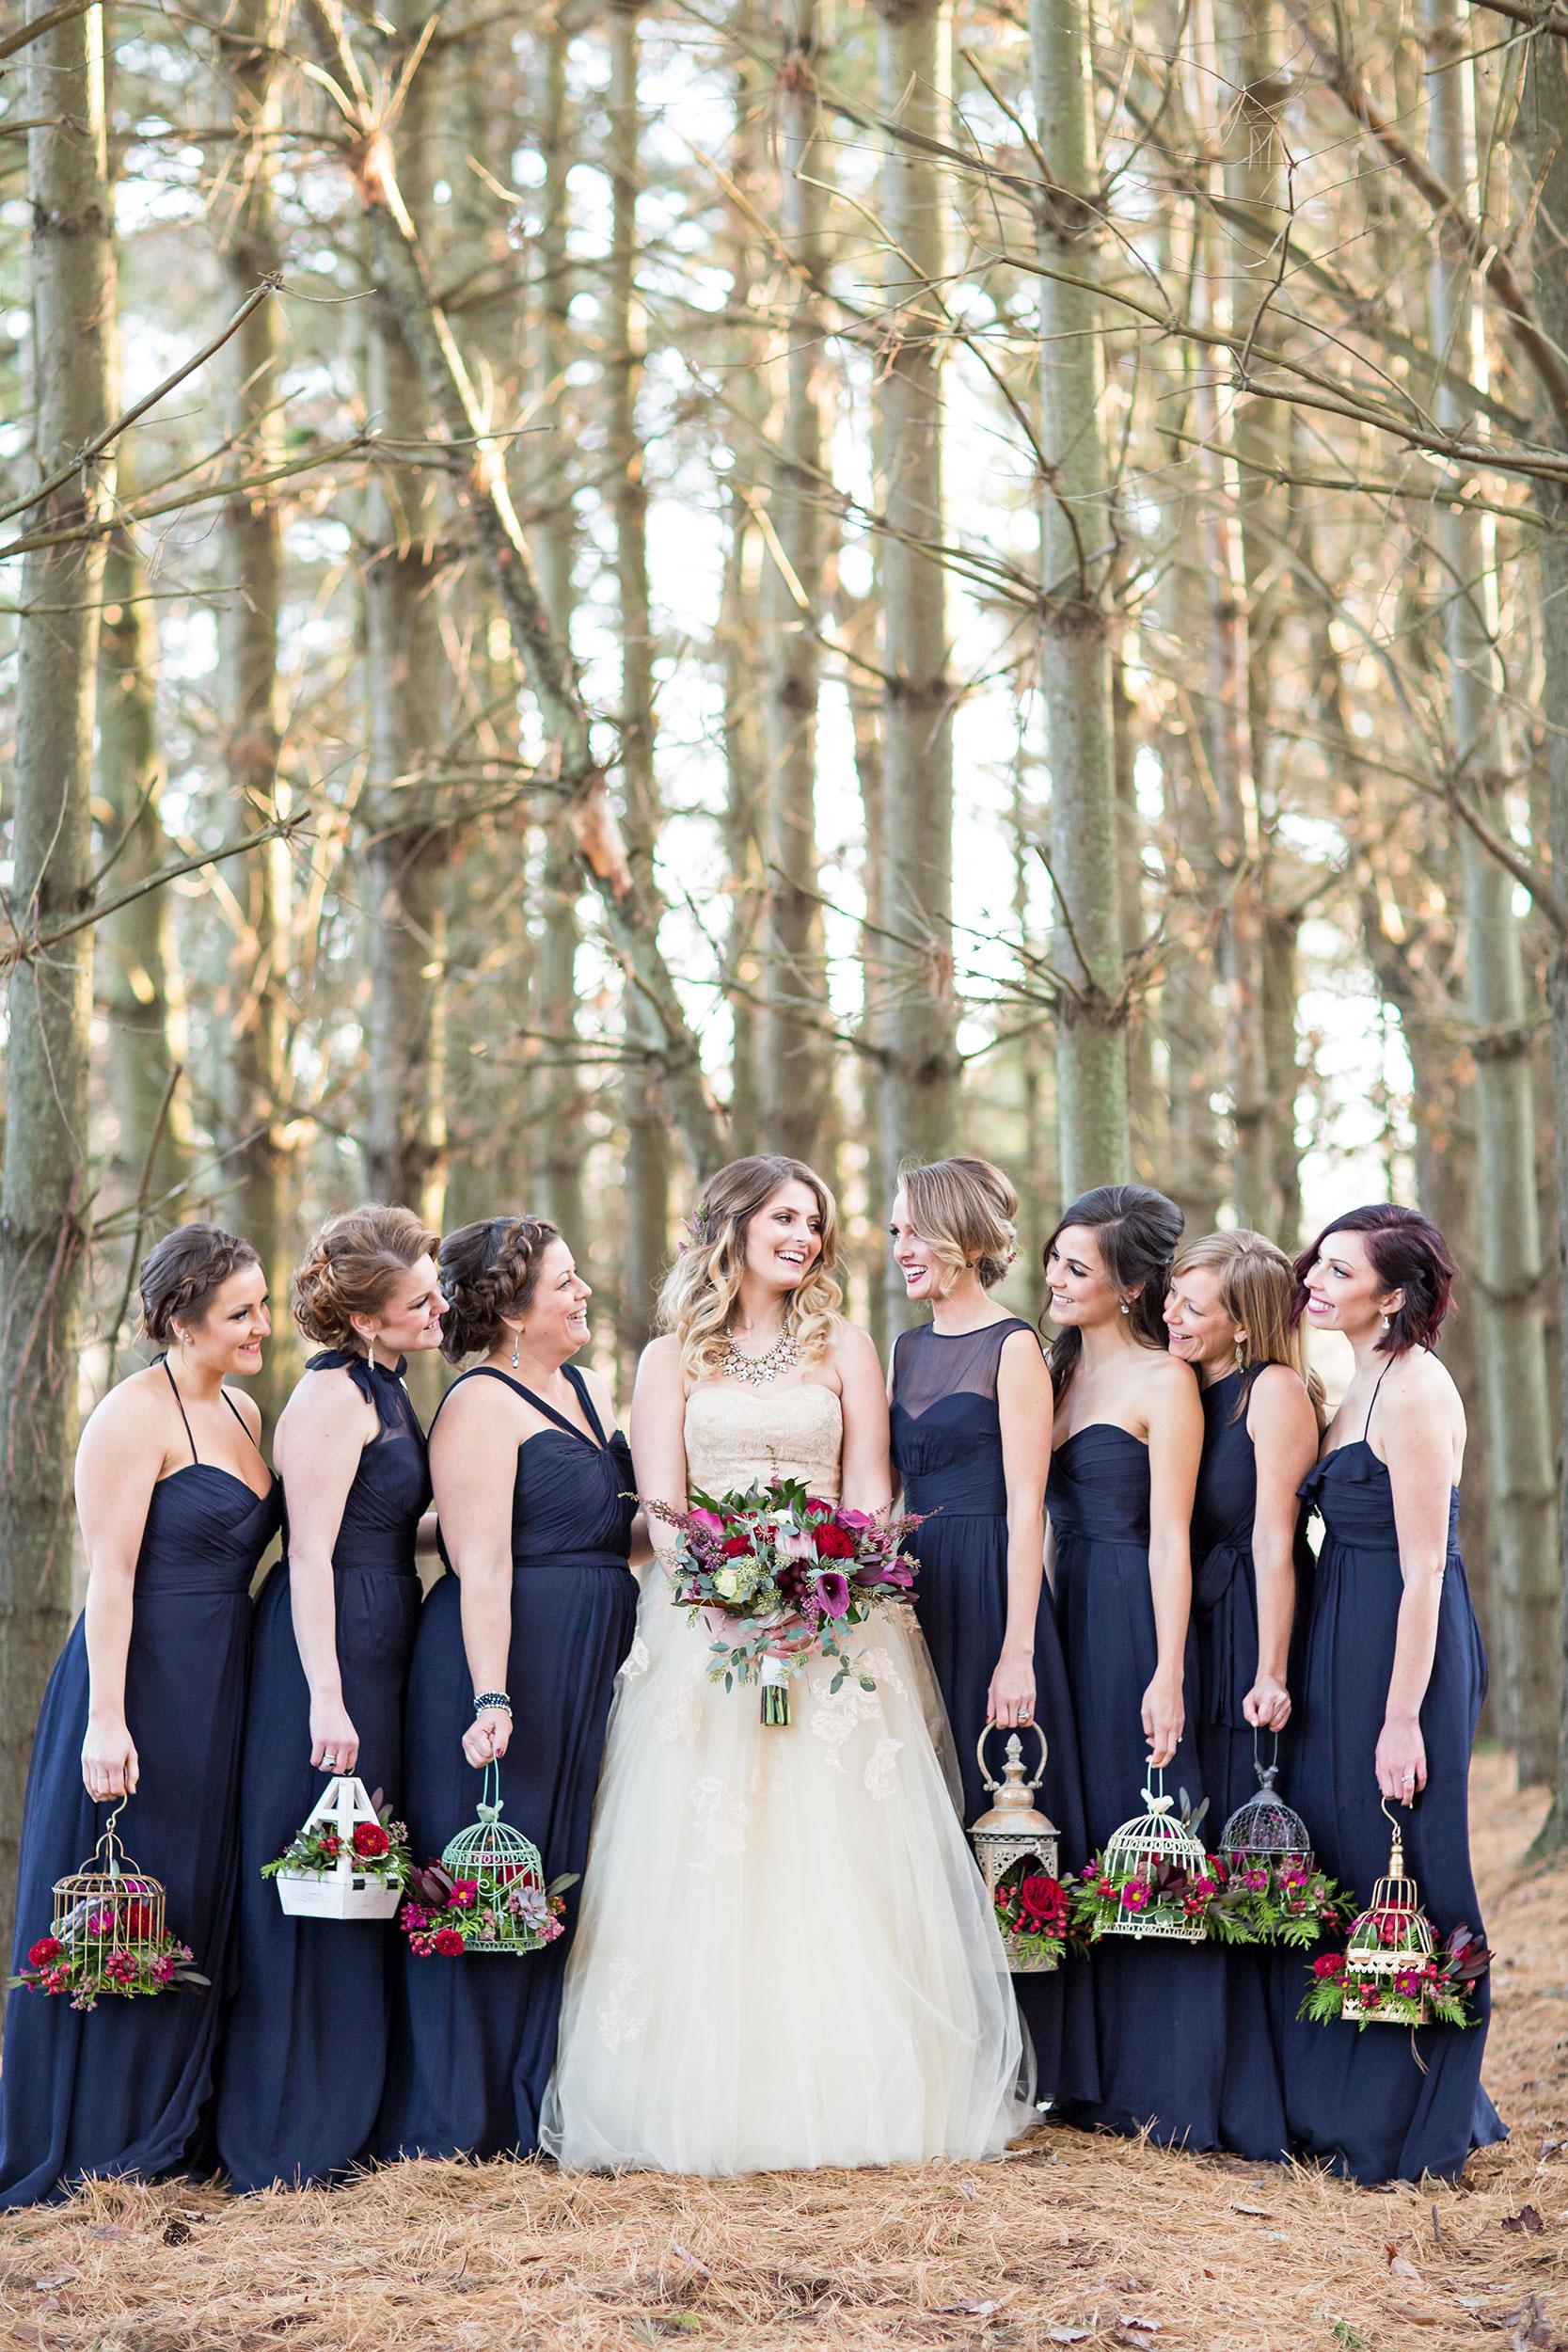 windsor-ontario-wedding-photographer-botanical-wedding-toronto-weddingbells-magazine-eryn-shea-photography-03.jpg